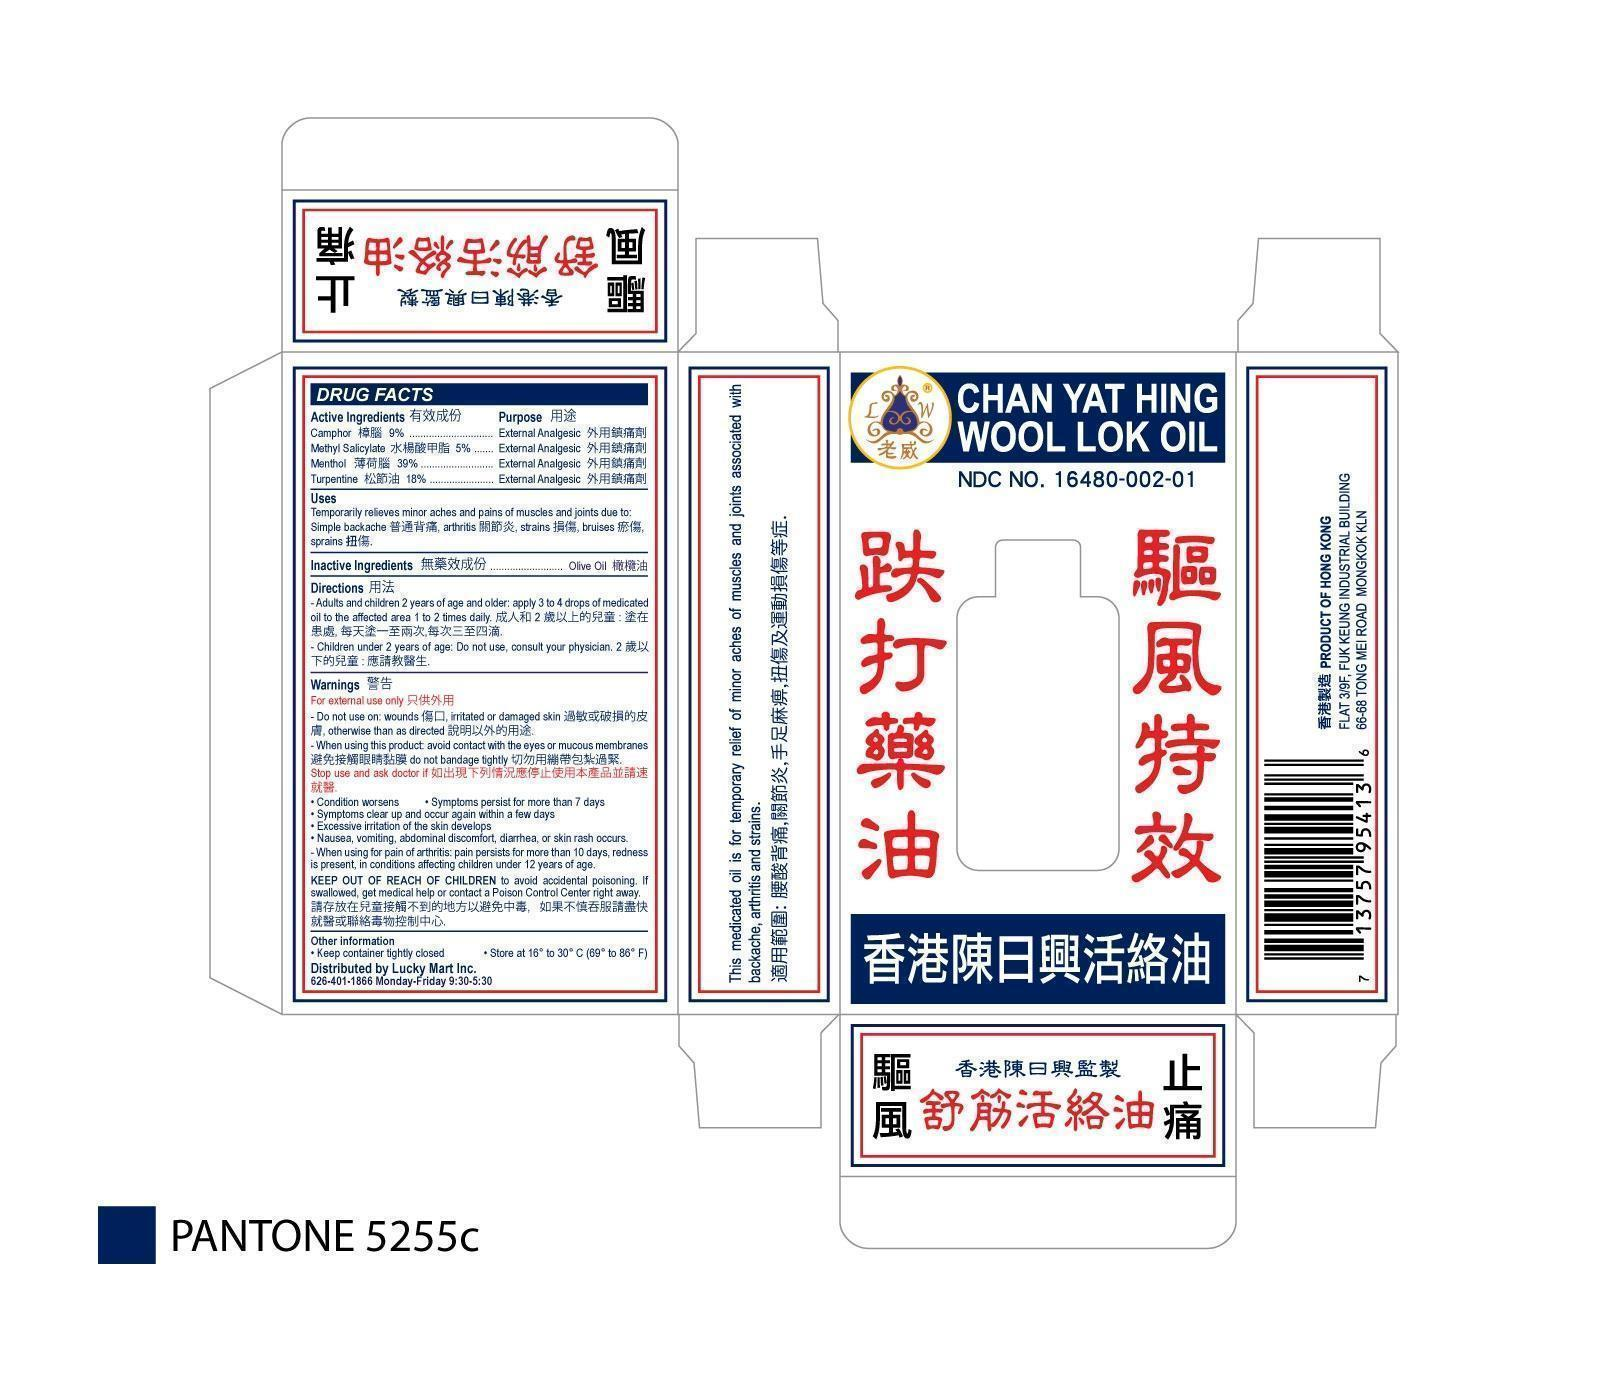 Chan Yat Hing She Kun Wool Lok Medicated Oil (Camphor, Menthol, Turpentine Oil) Oil [Chan Yat Hing Medicine Factory]